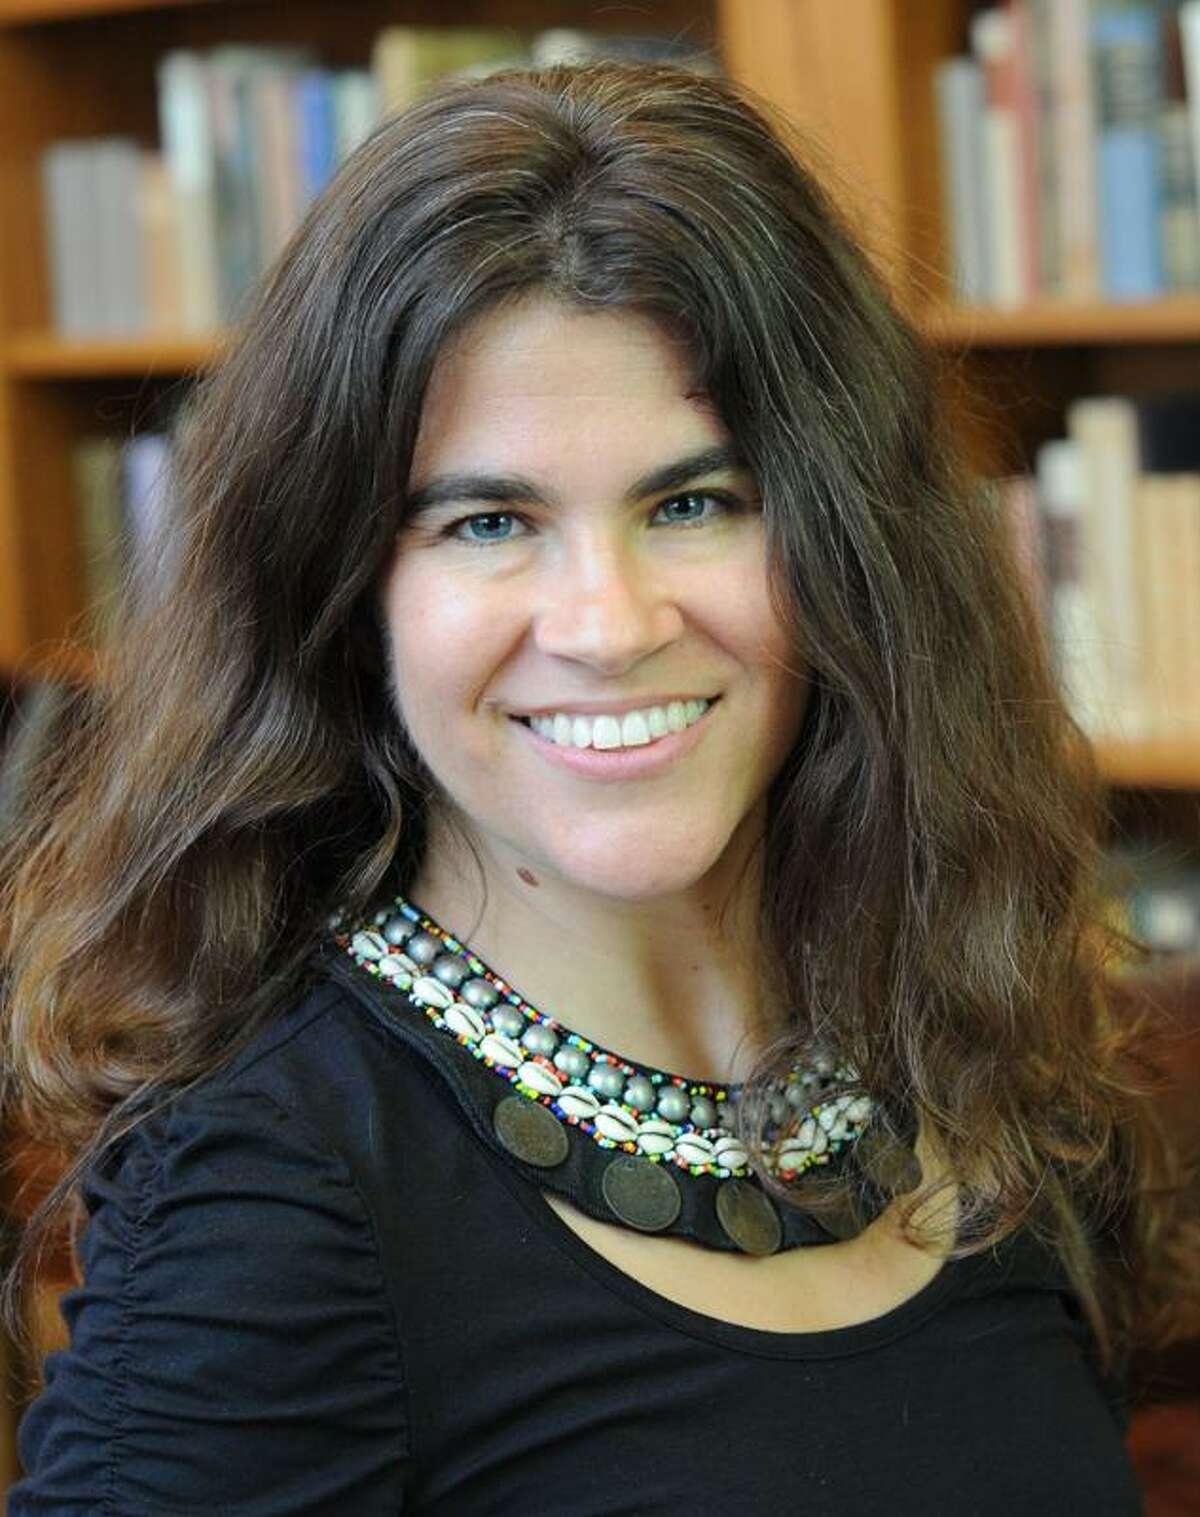 Scholar Stephanie Elizondo Griest researches border culture around the world.